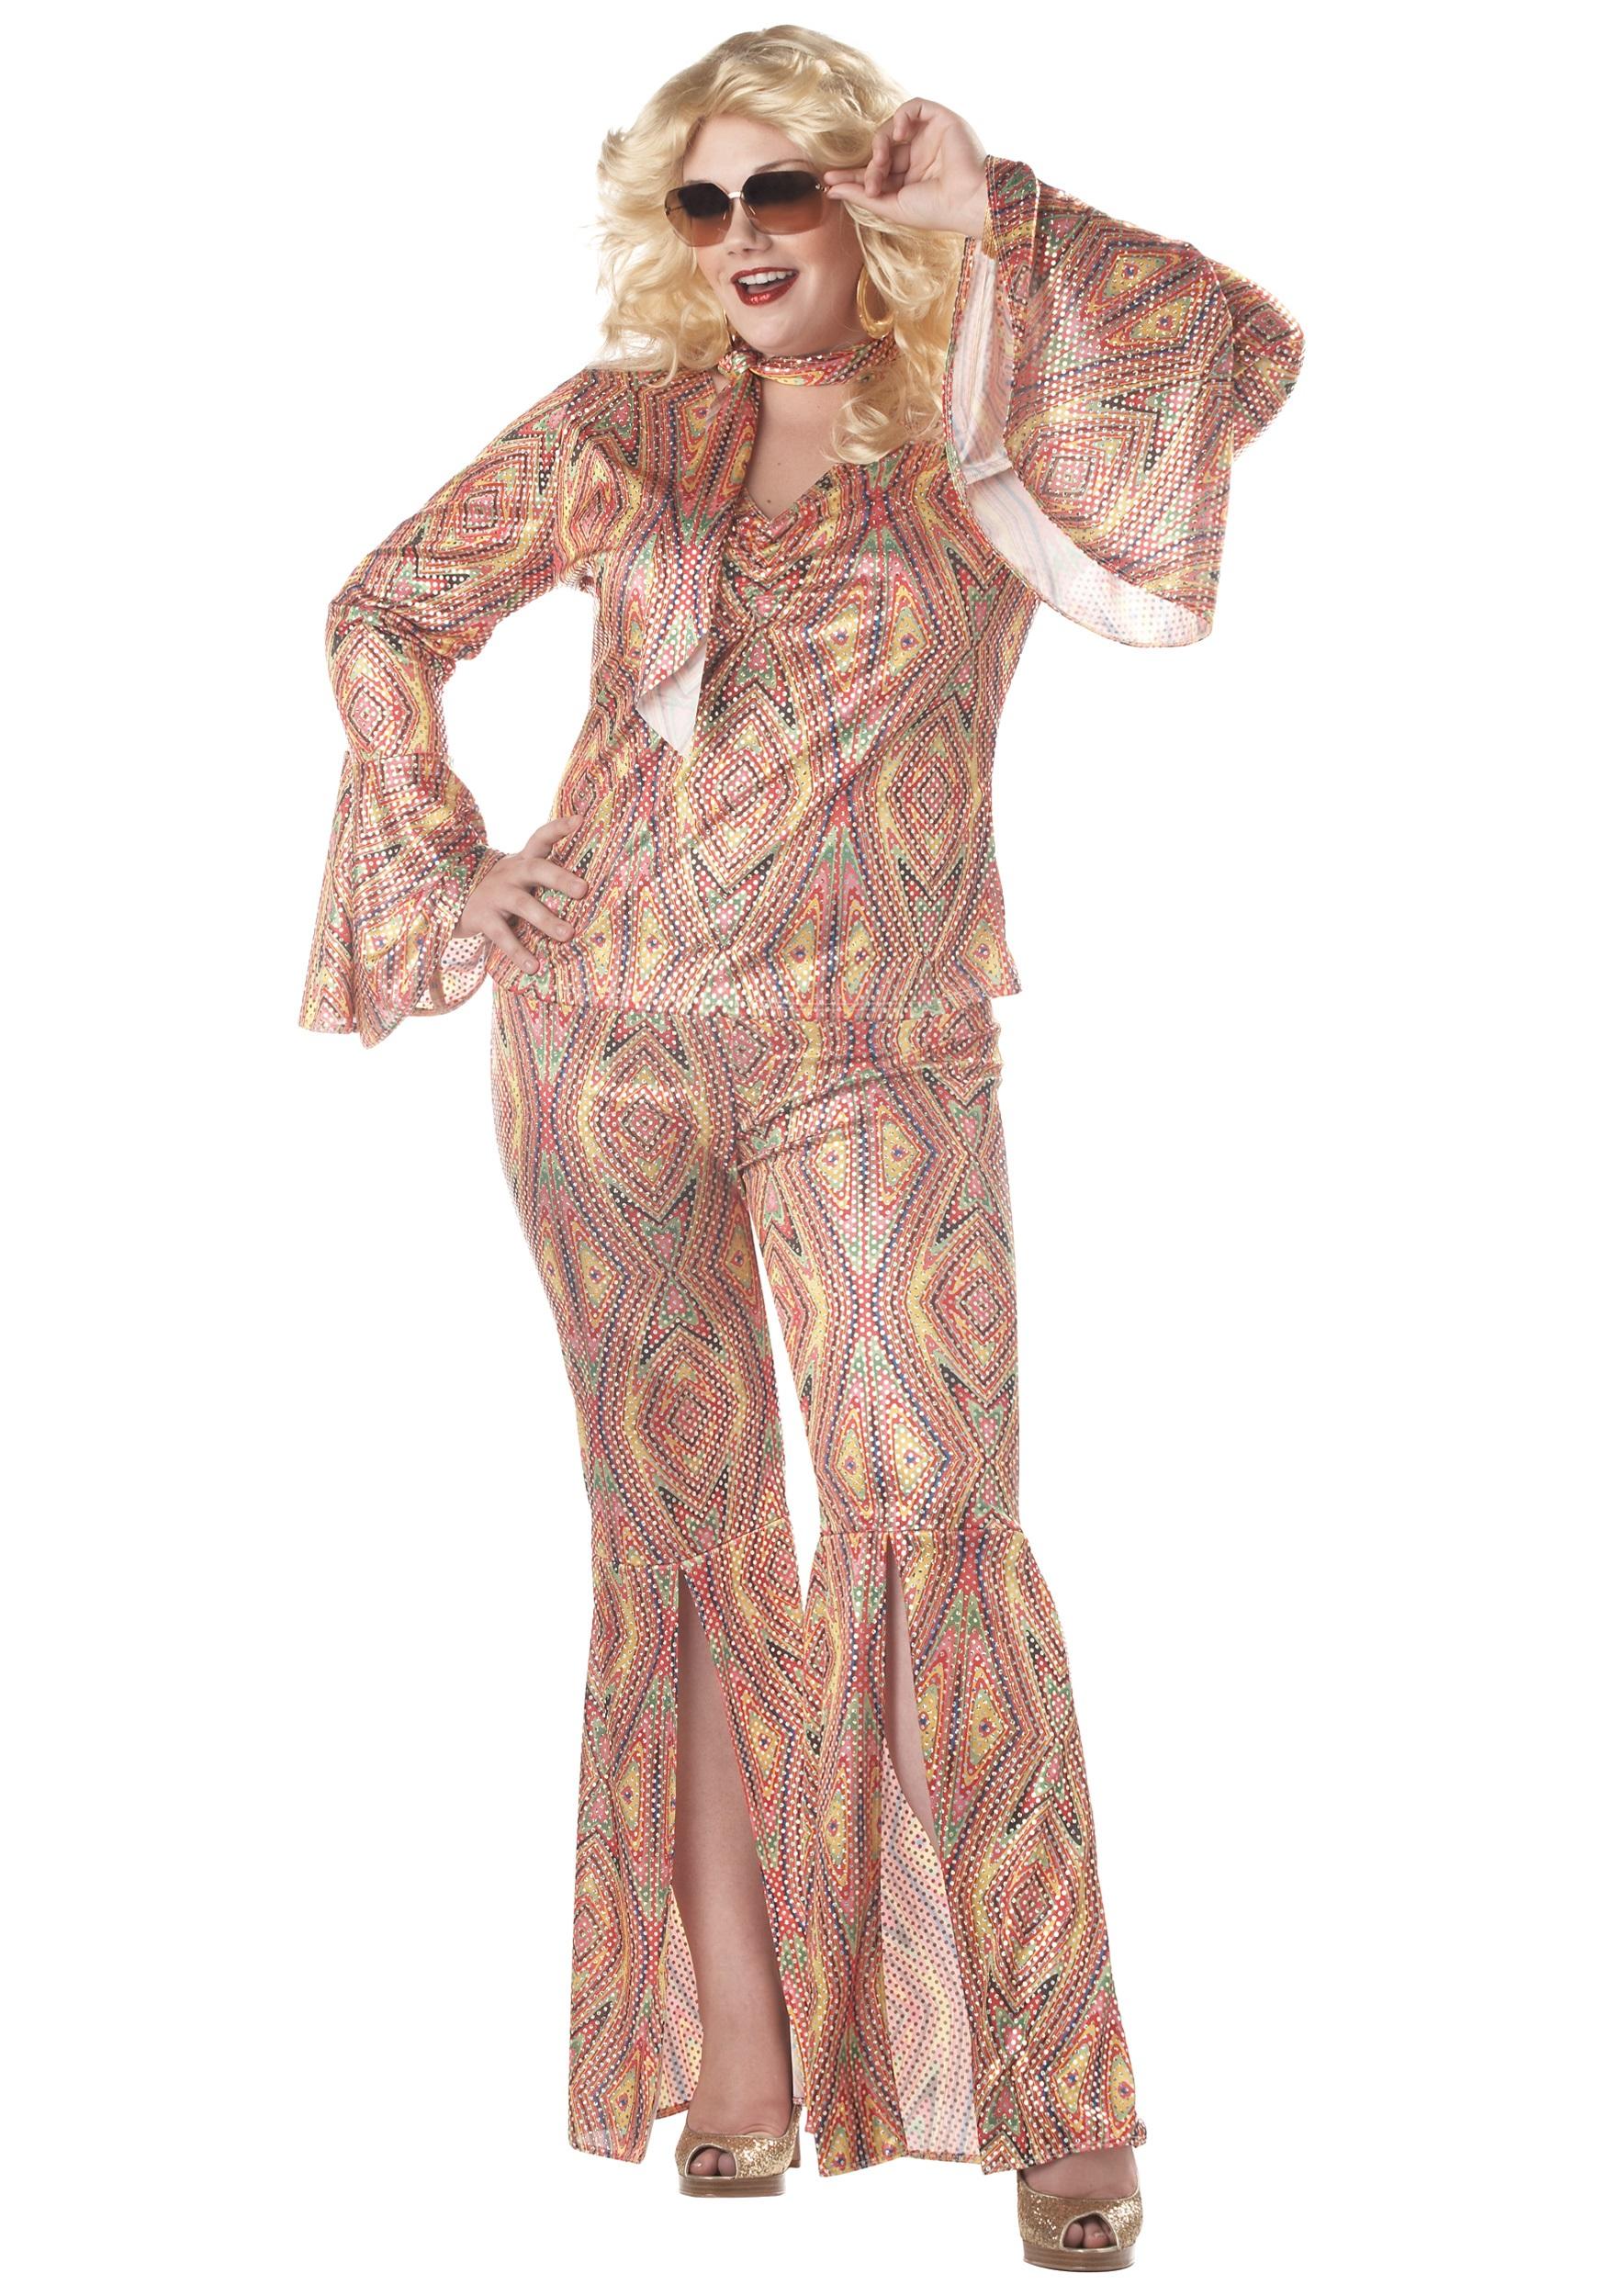 Plus Size DiscoLicious Costume  sc 1 st  Halloween Costume & Plus Size DiscoLicious Costume - Womens 70s Disco Plus Size Costumes